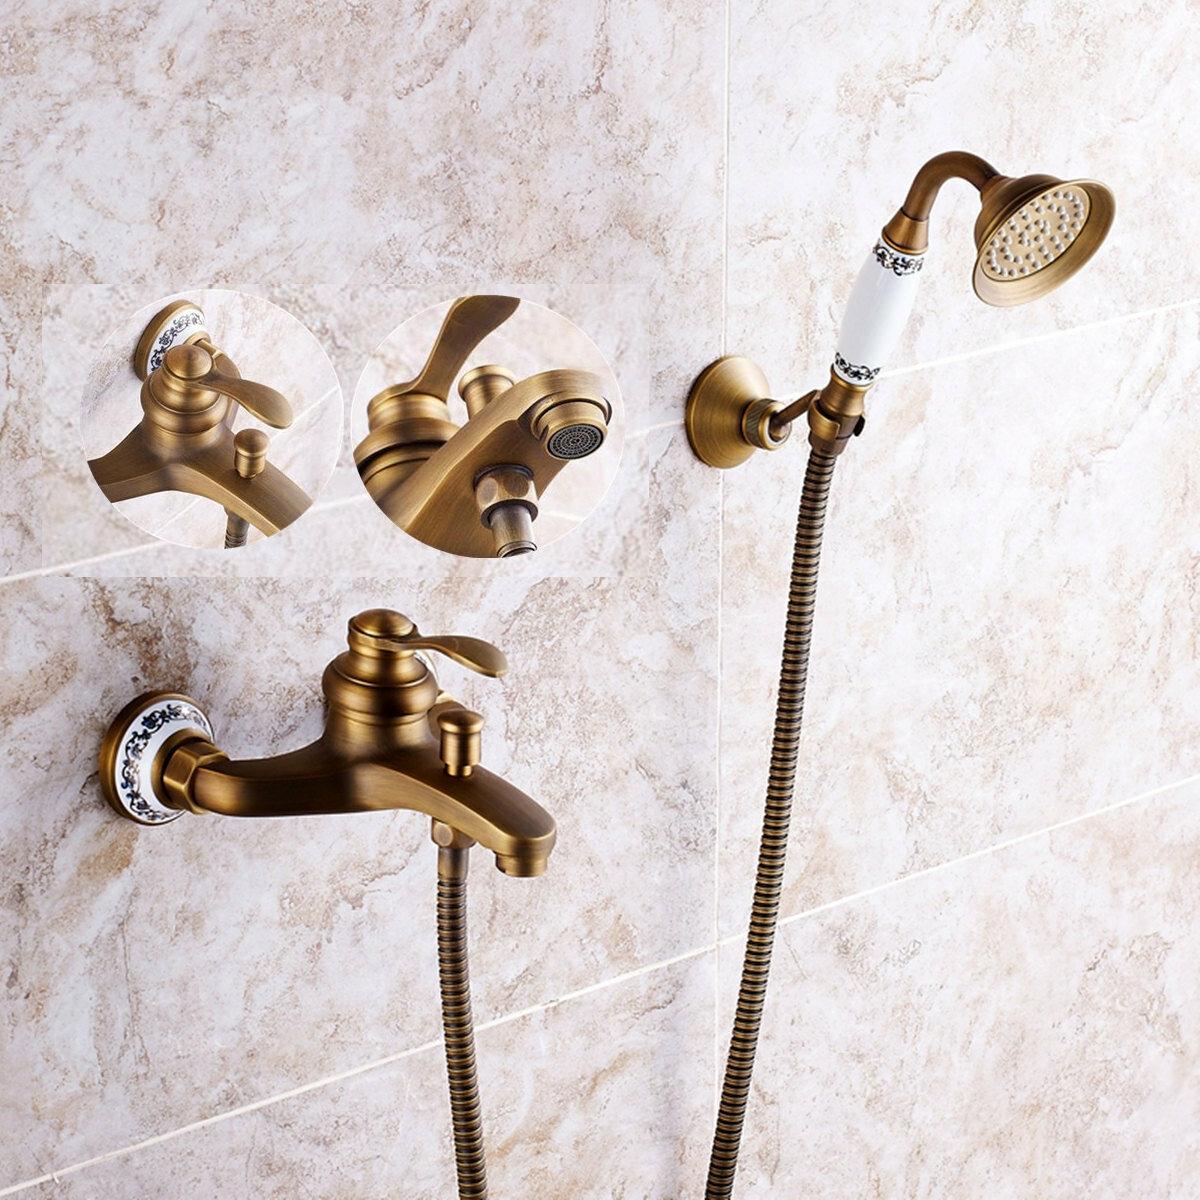 Antique Brass Shower Head Bathroom Tub Faucet Hand Held Tap Spray Waterfall Set